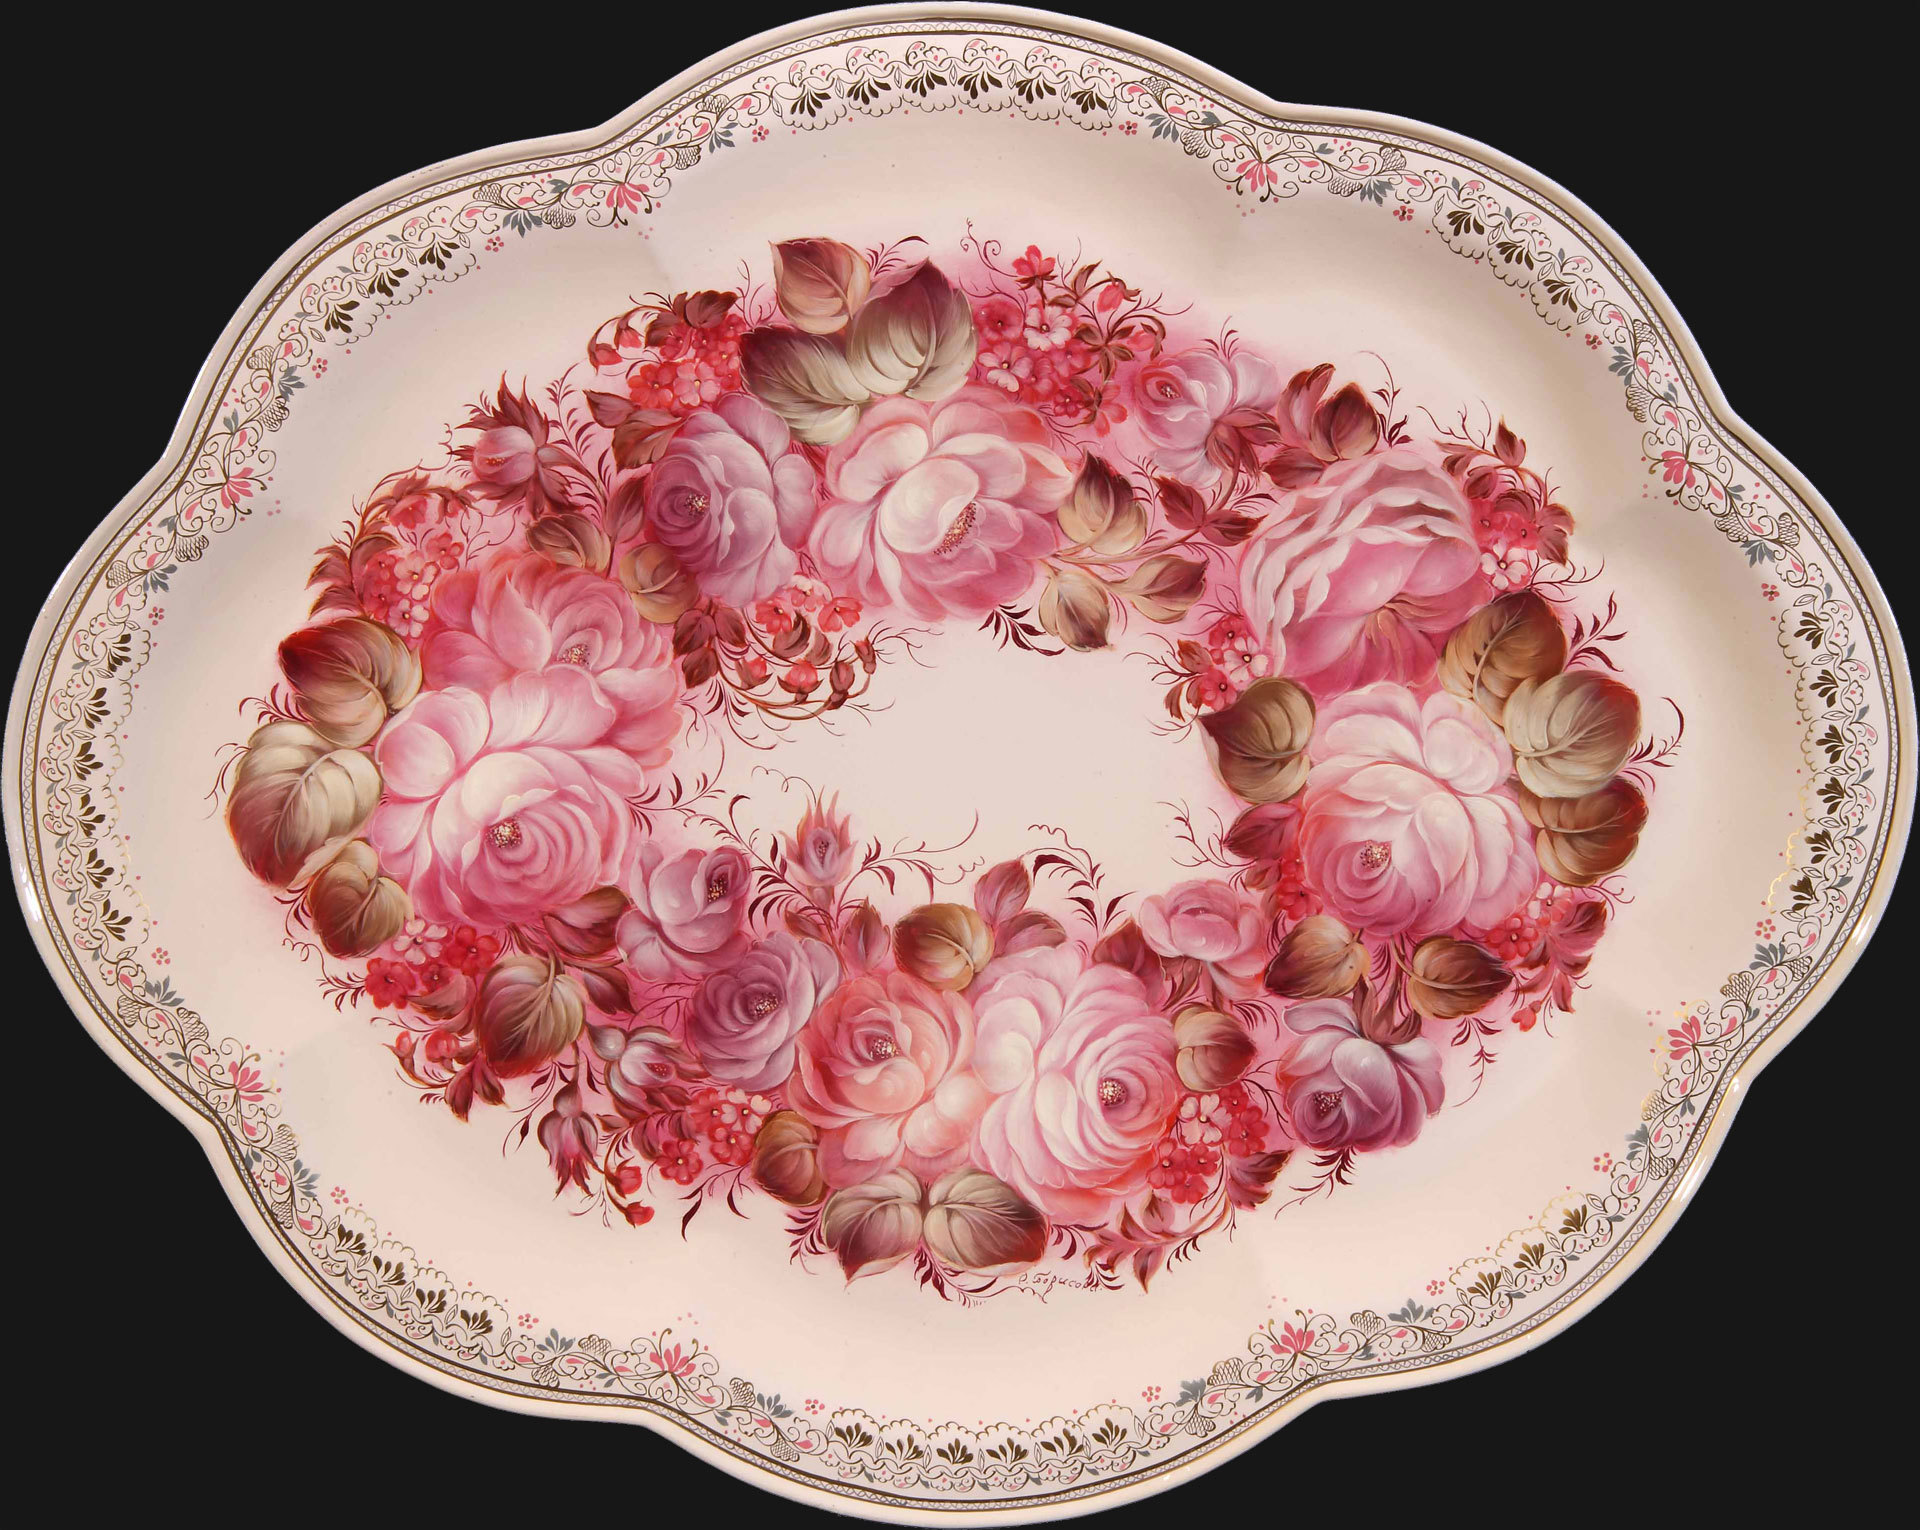 Chaplet of roses